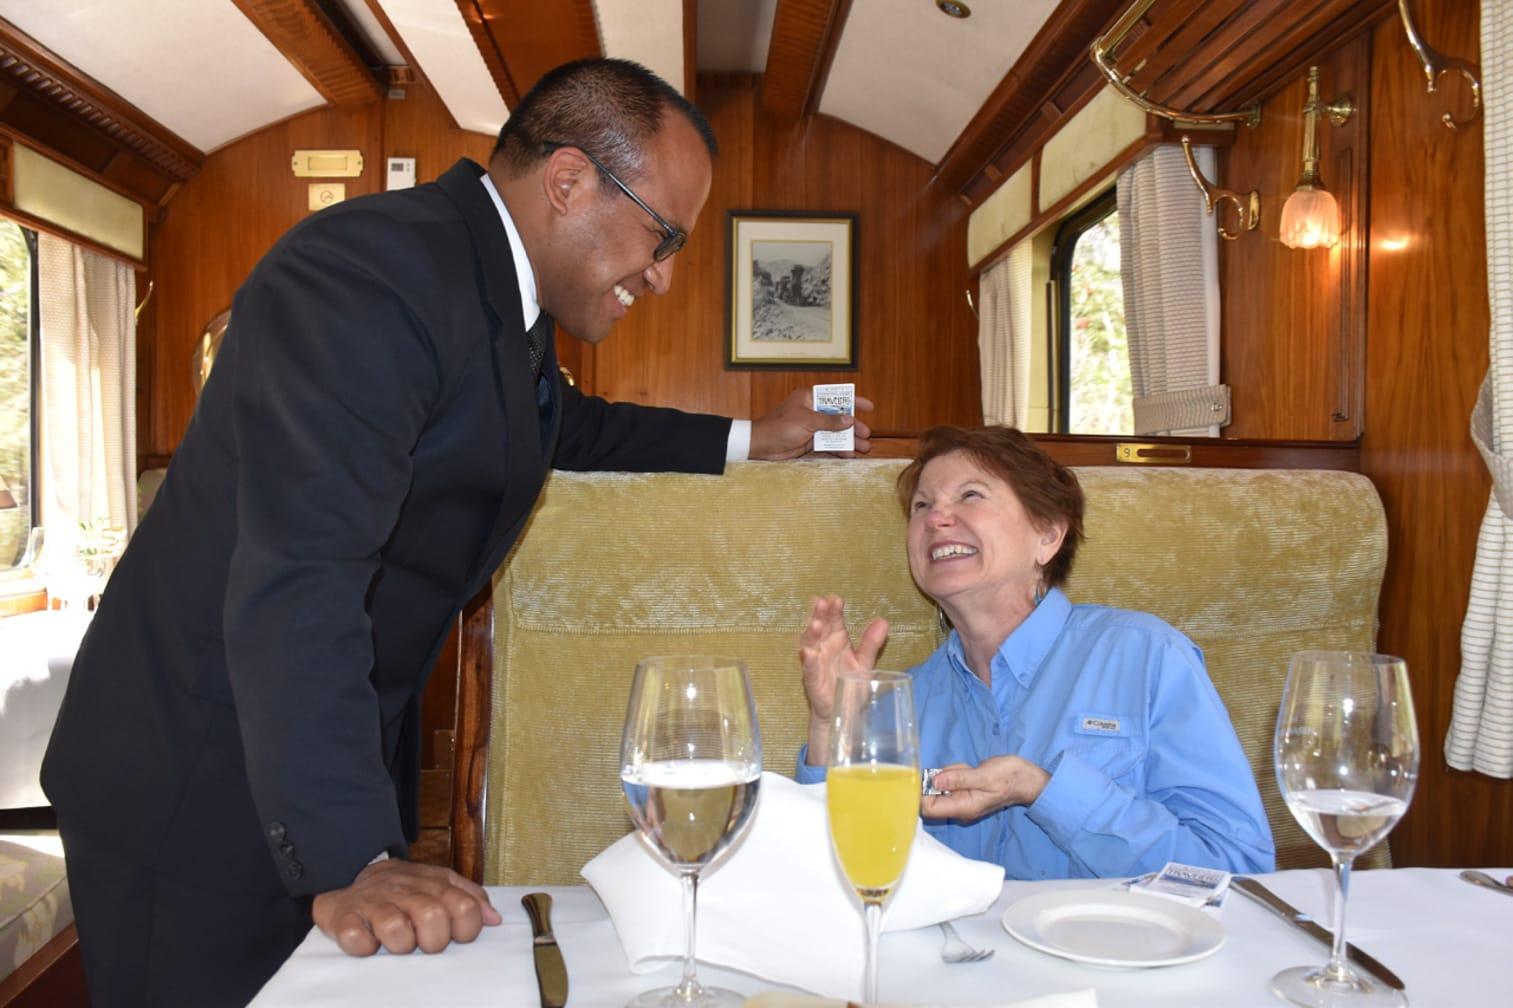 Belmond Hiram Bingham train staff speaking with a guest